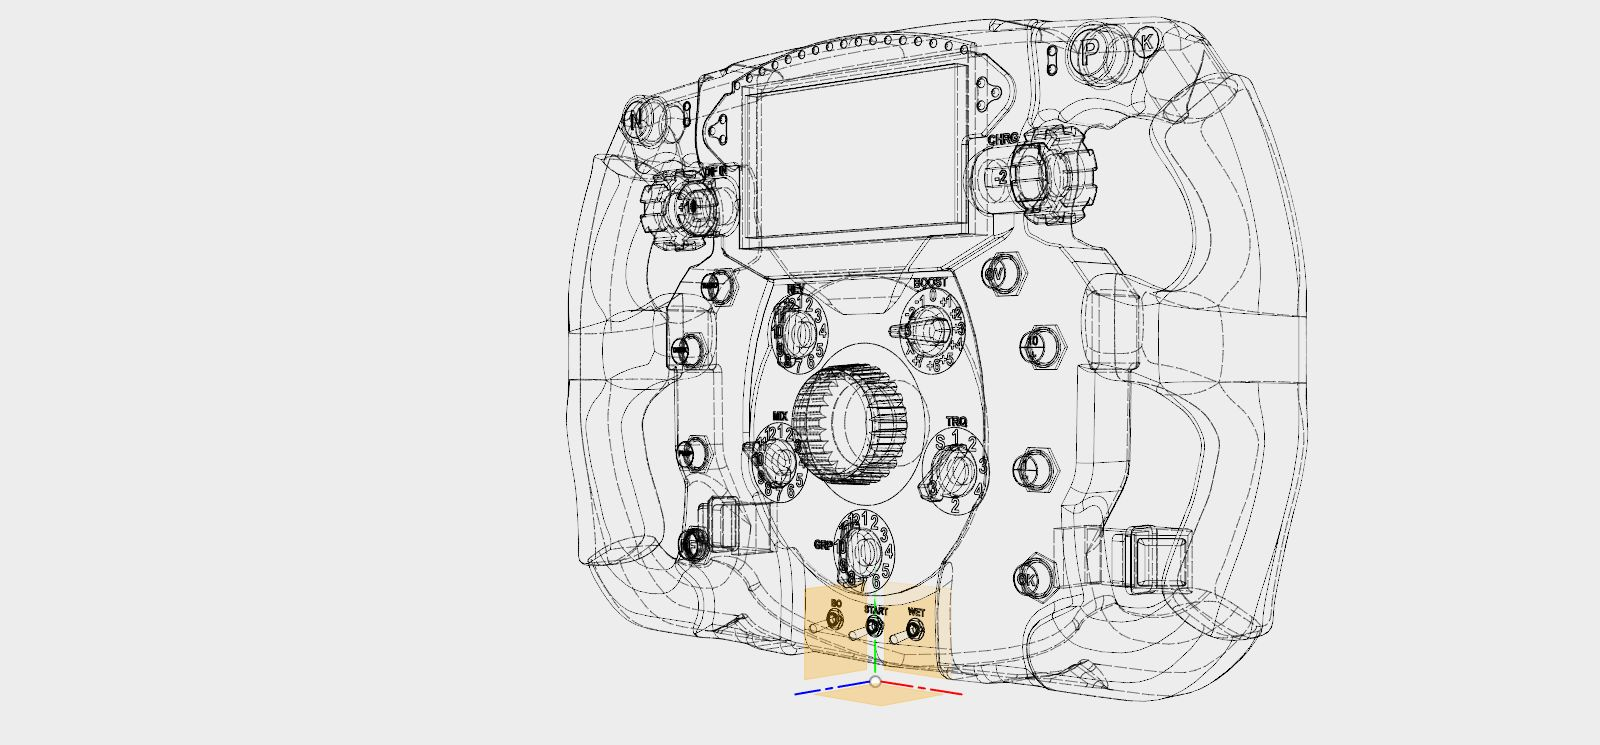 F1-steering-wheel-f-v2-v1-v1-v1-3500-3500